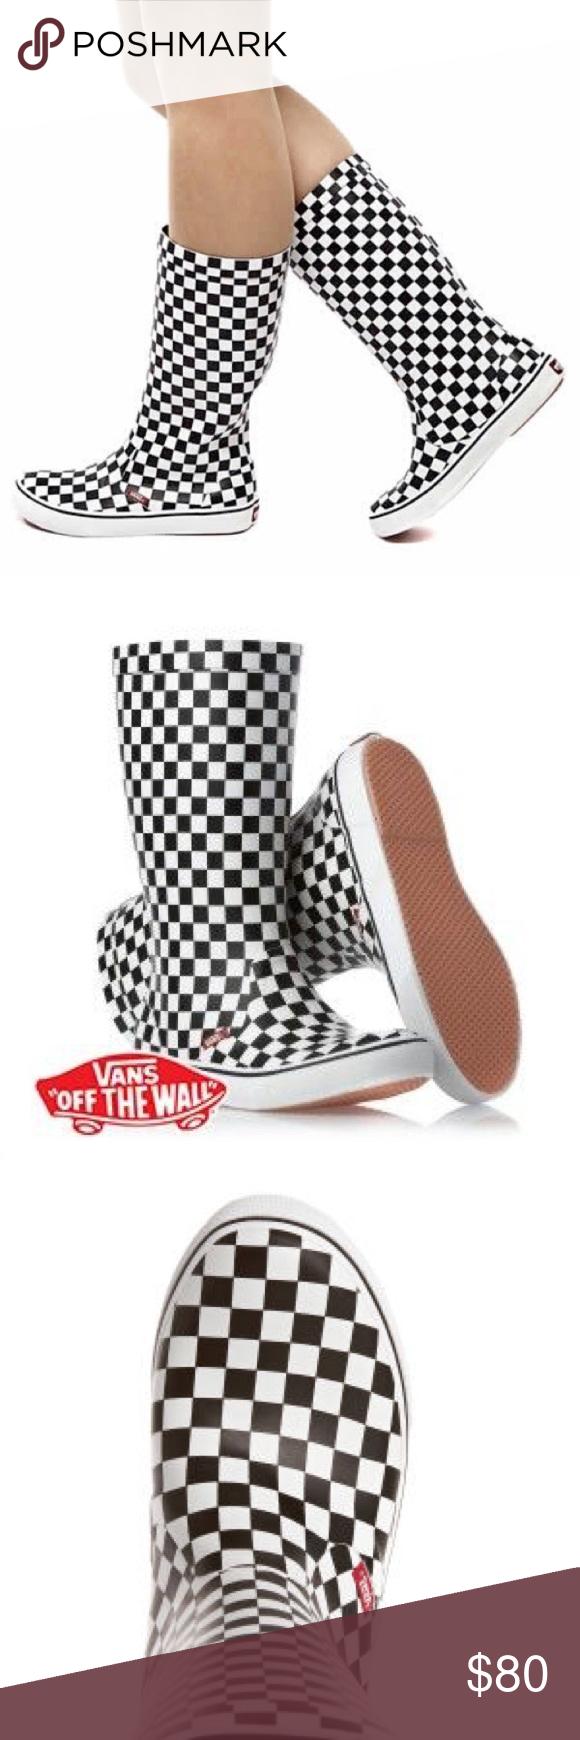 3d2f6aadee Vans Checkered Rainfall Boots Brand new